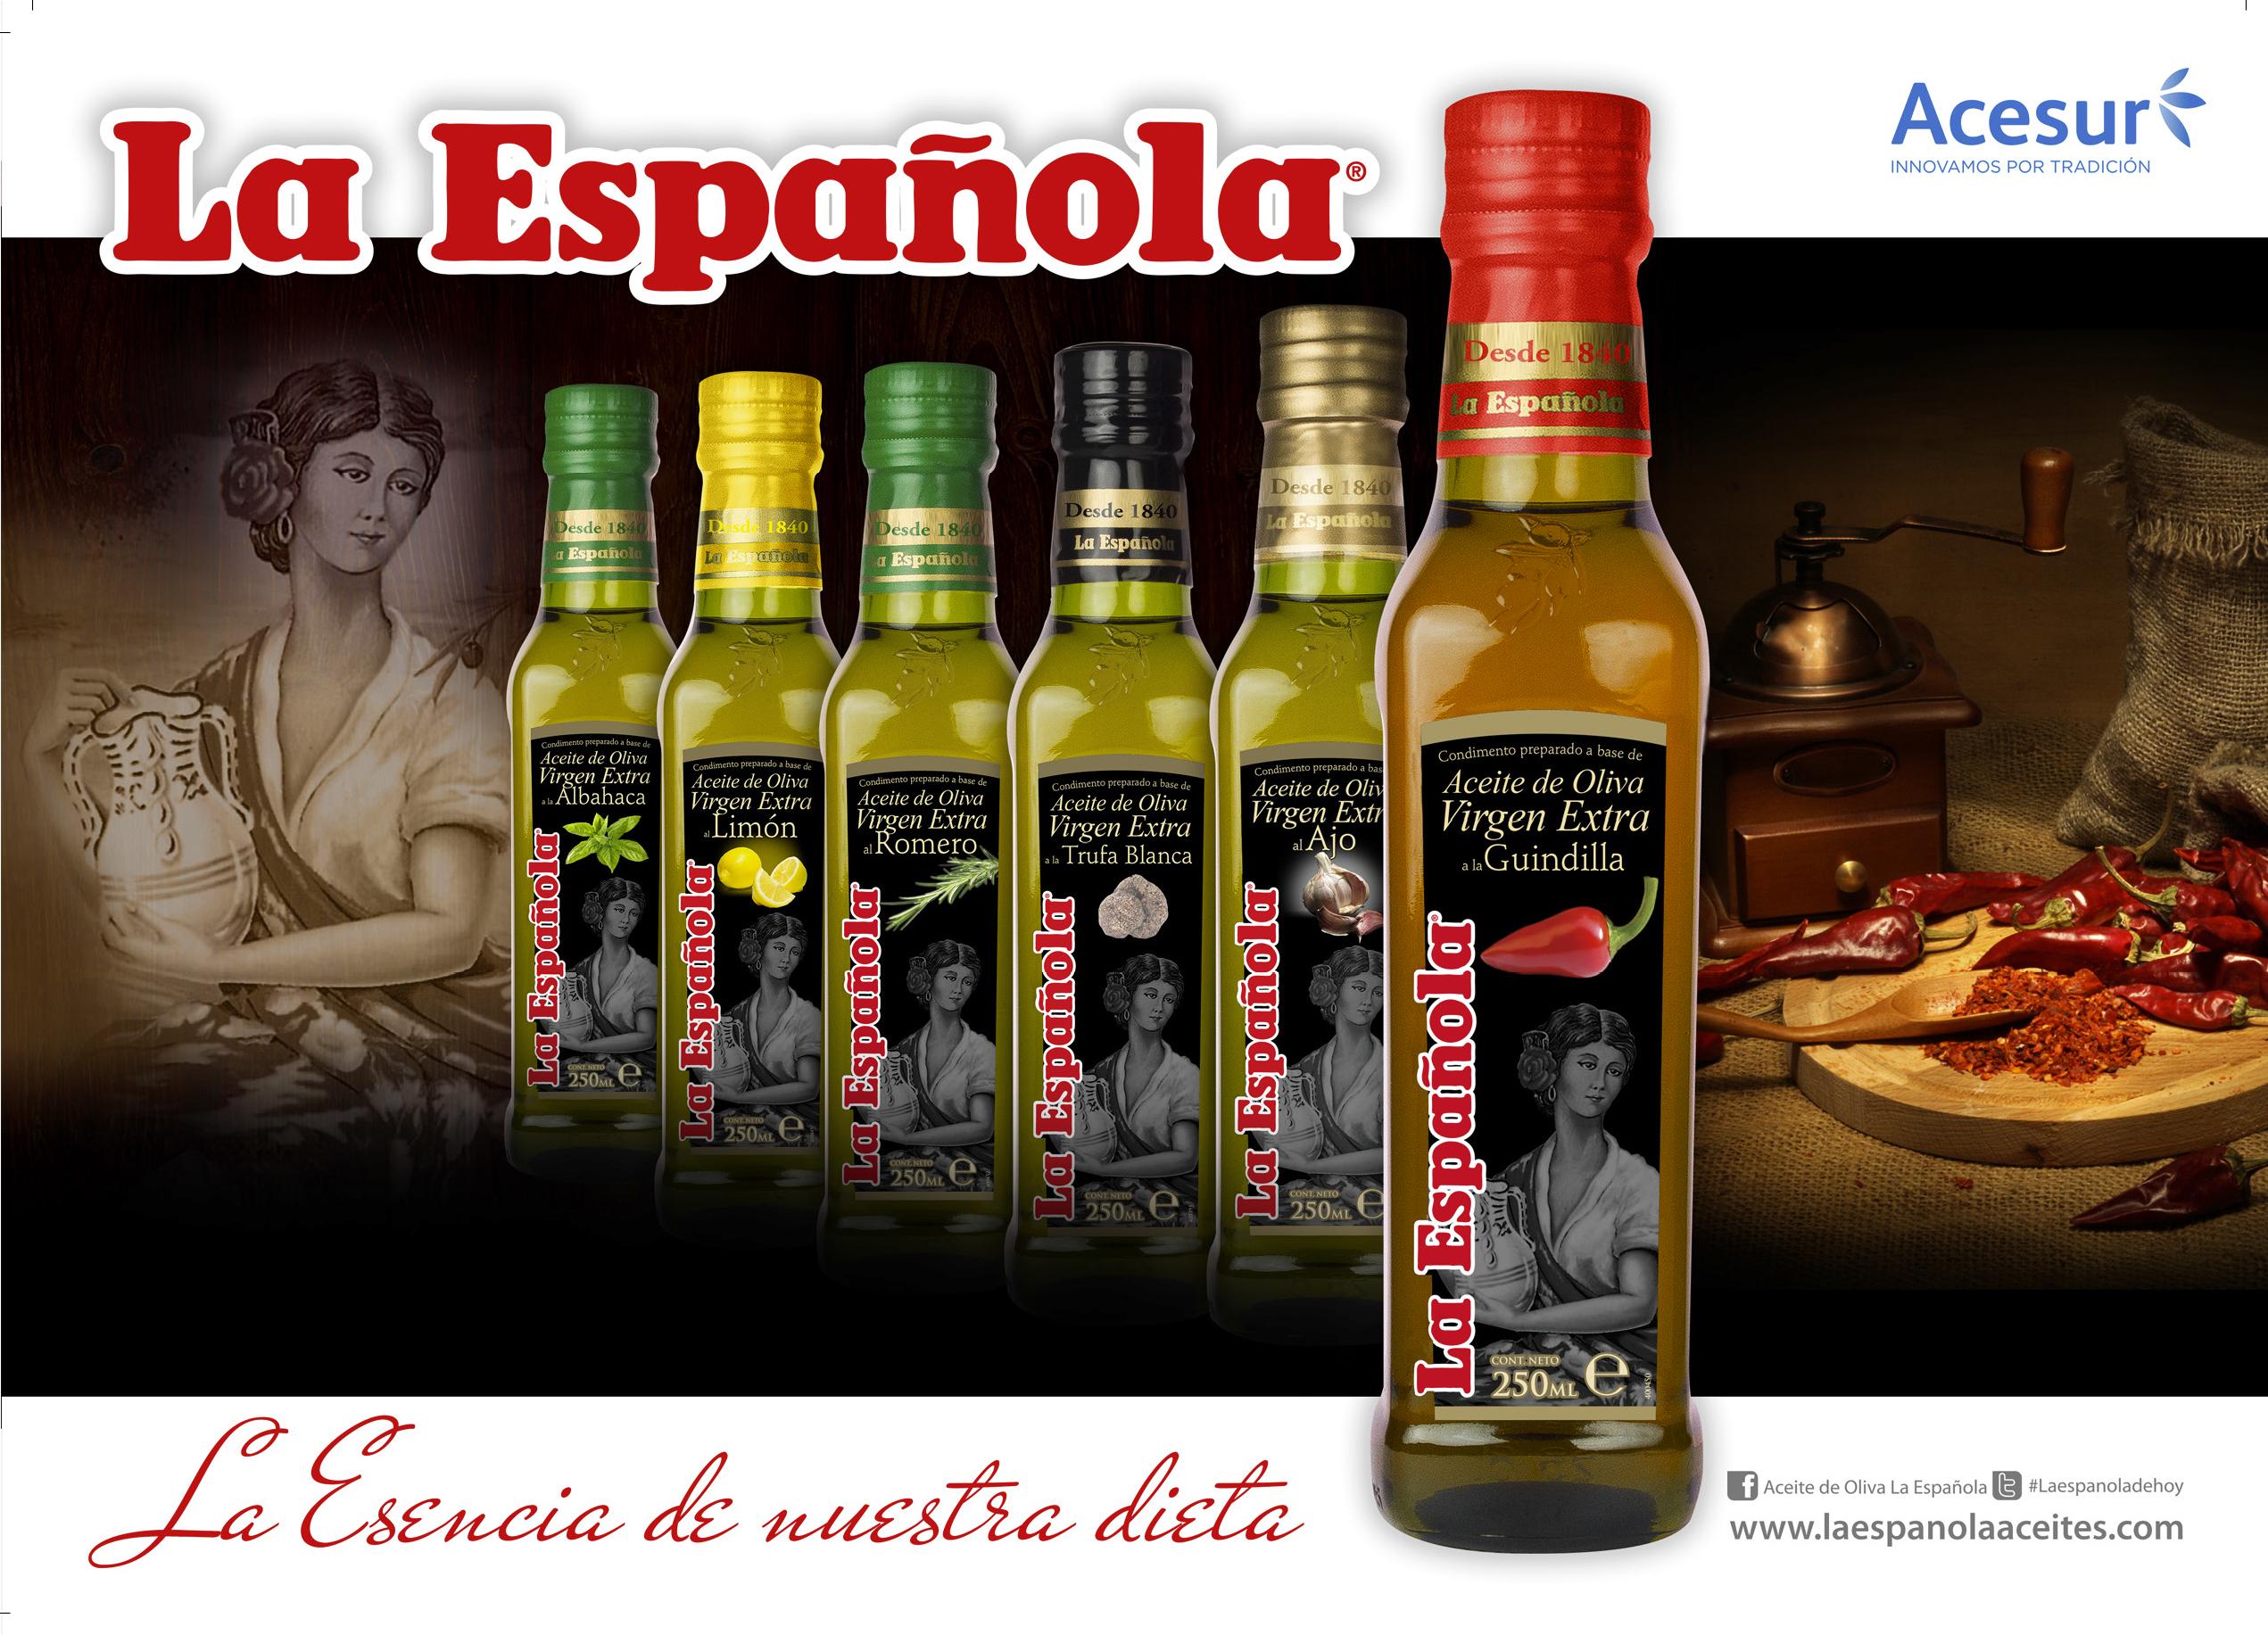 http://www.marcasrenombradas.com/wp-content/uploads/2014/07/laespanola-3.jpg